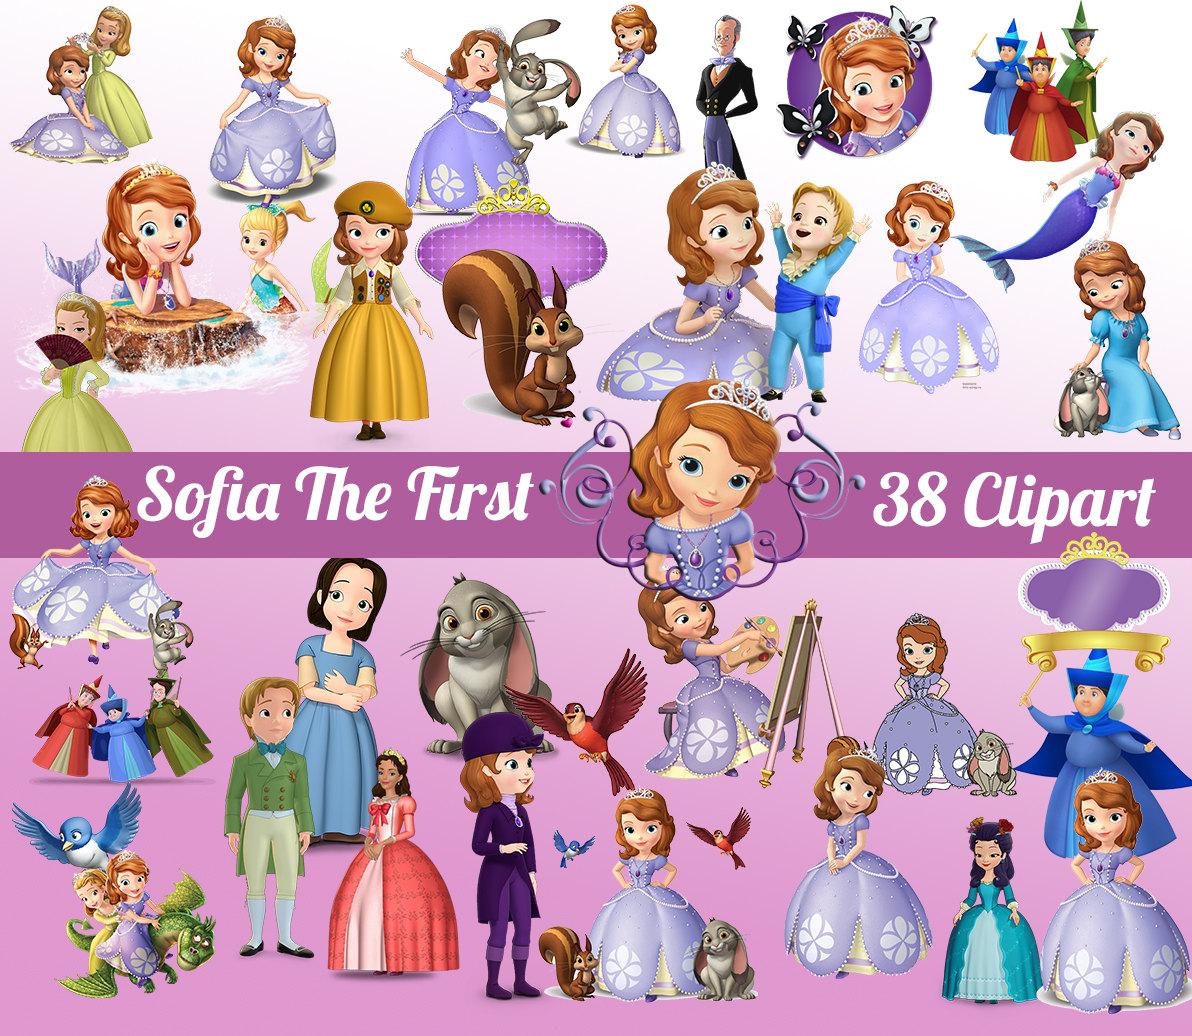 Sofia Sofia first 38 image